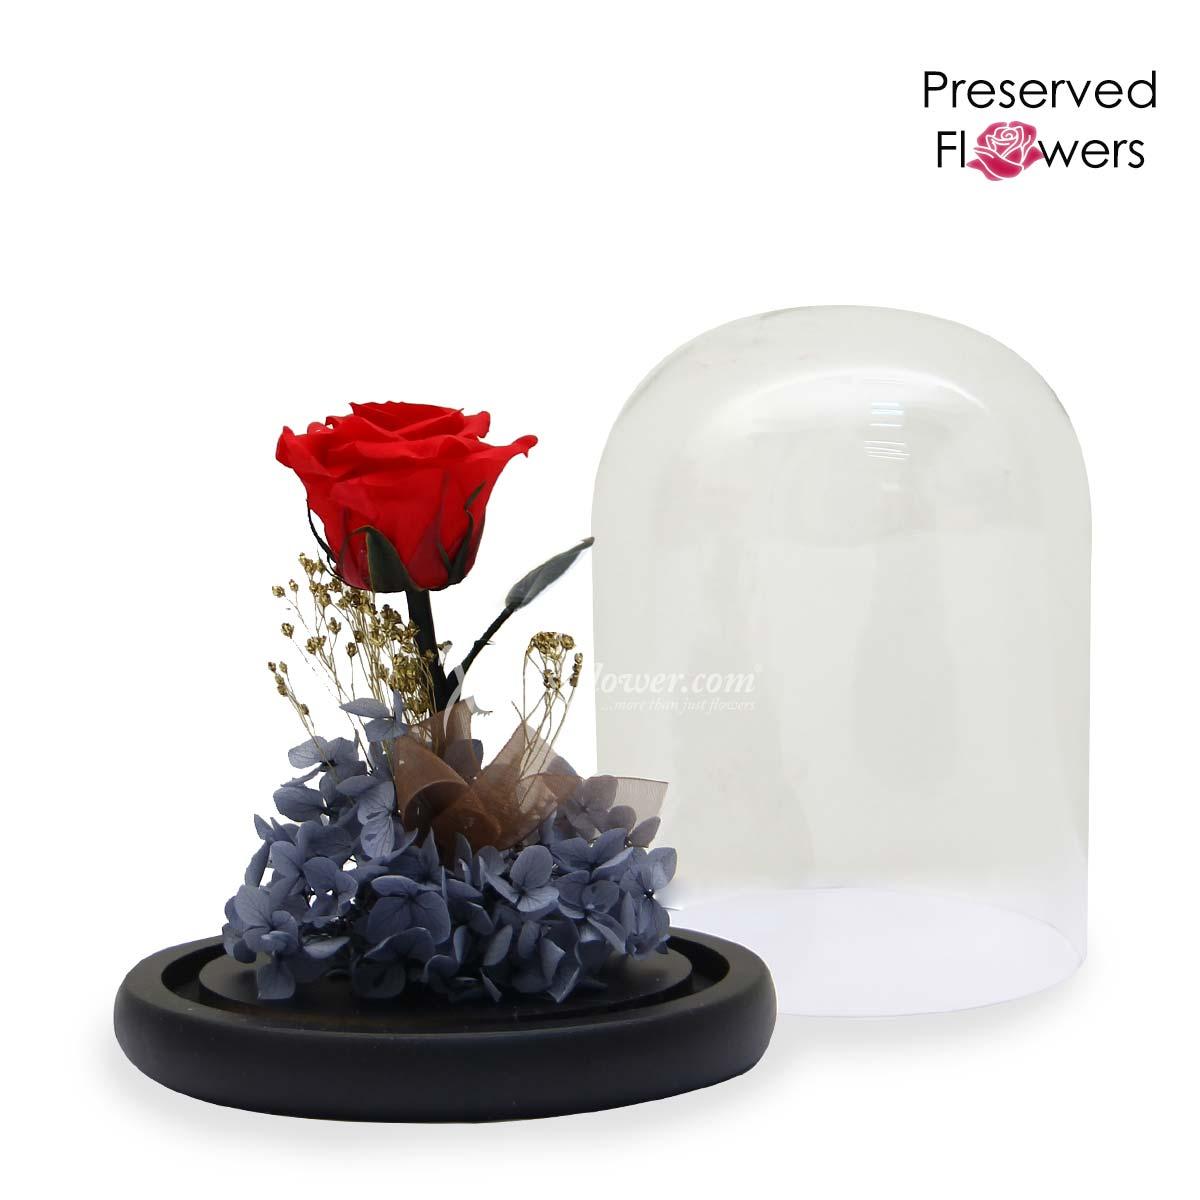 PR2106 Love at Midnight Preserved Flowers